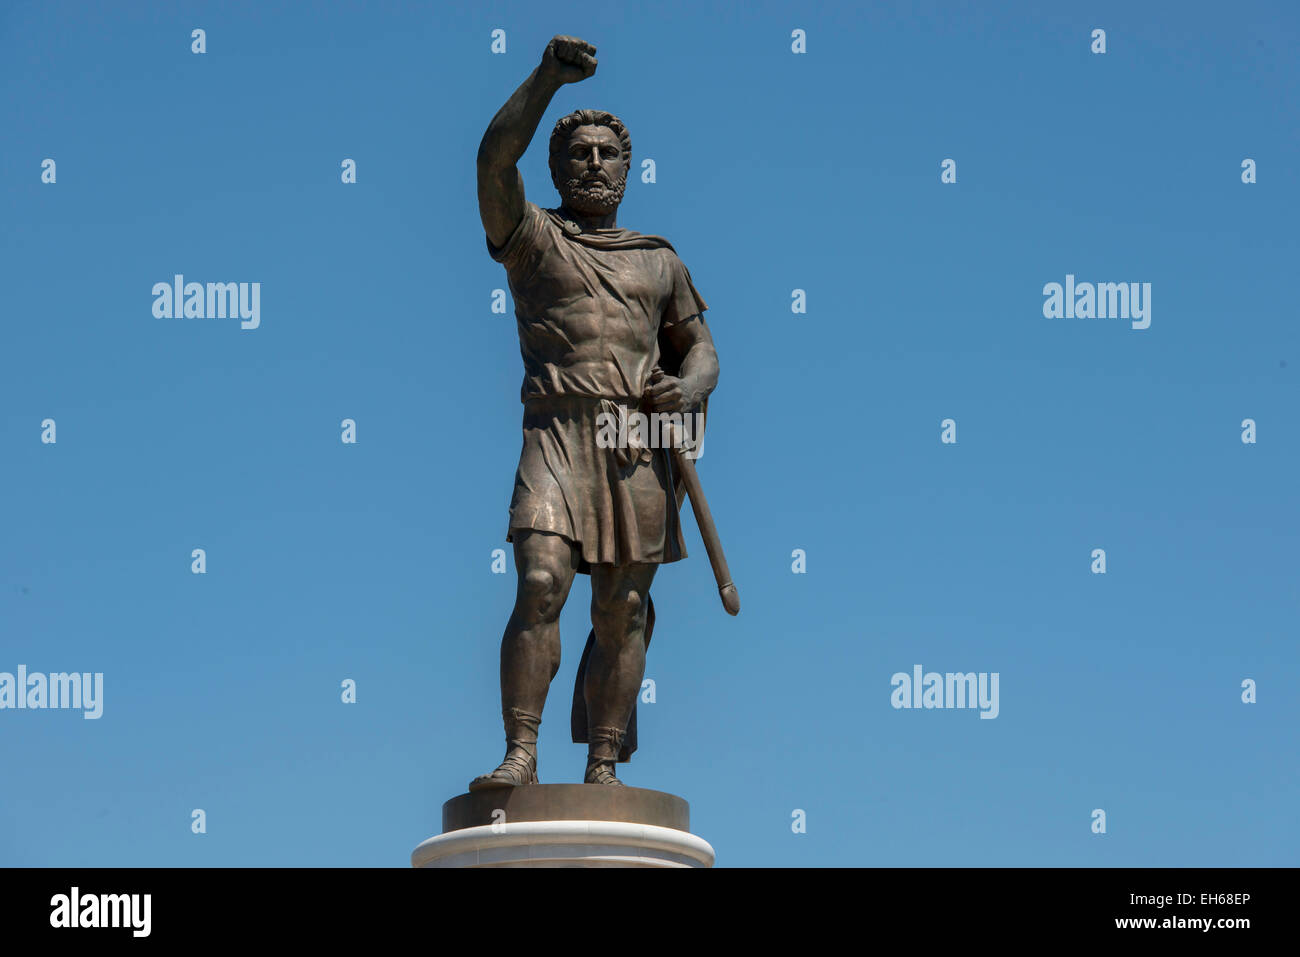 Statue Of Macedonian Hero, Skopje - Stock Image